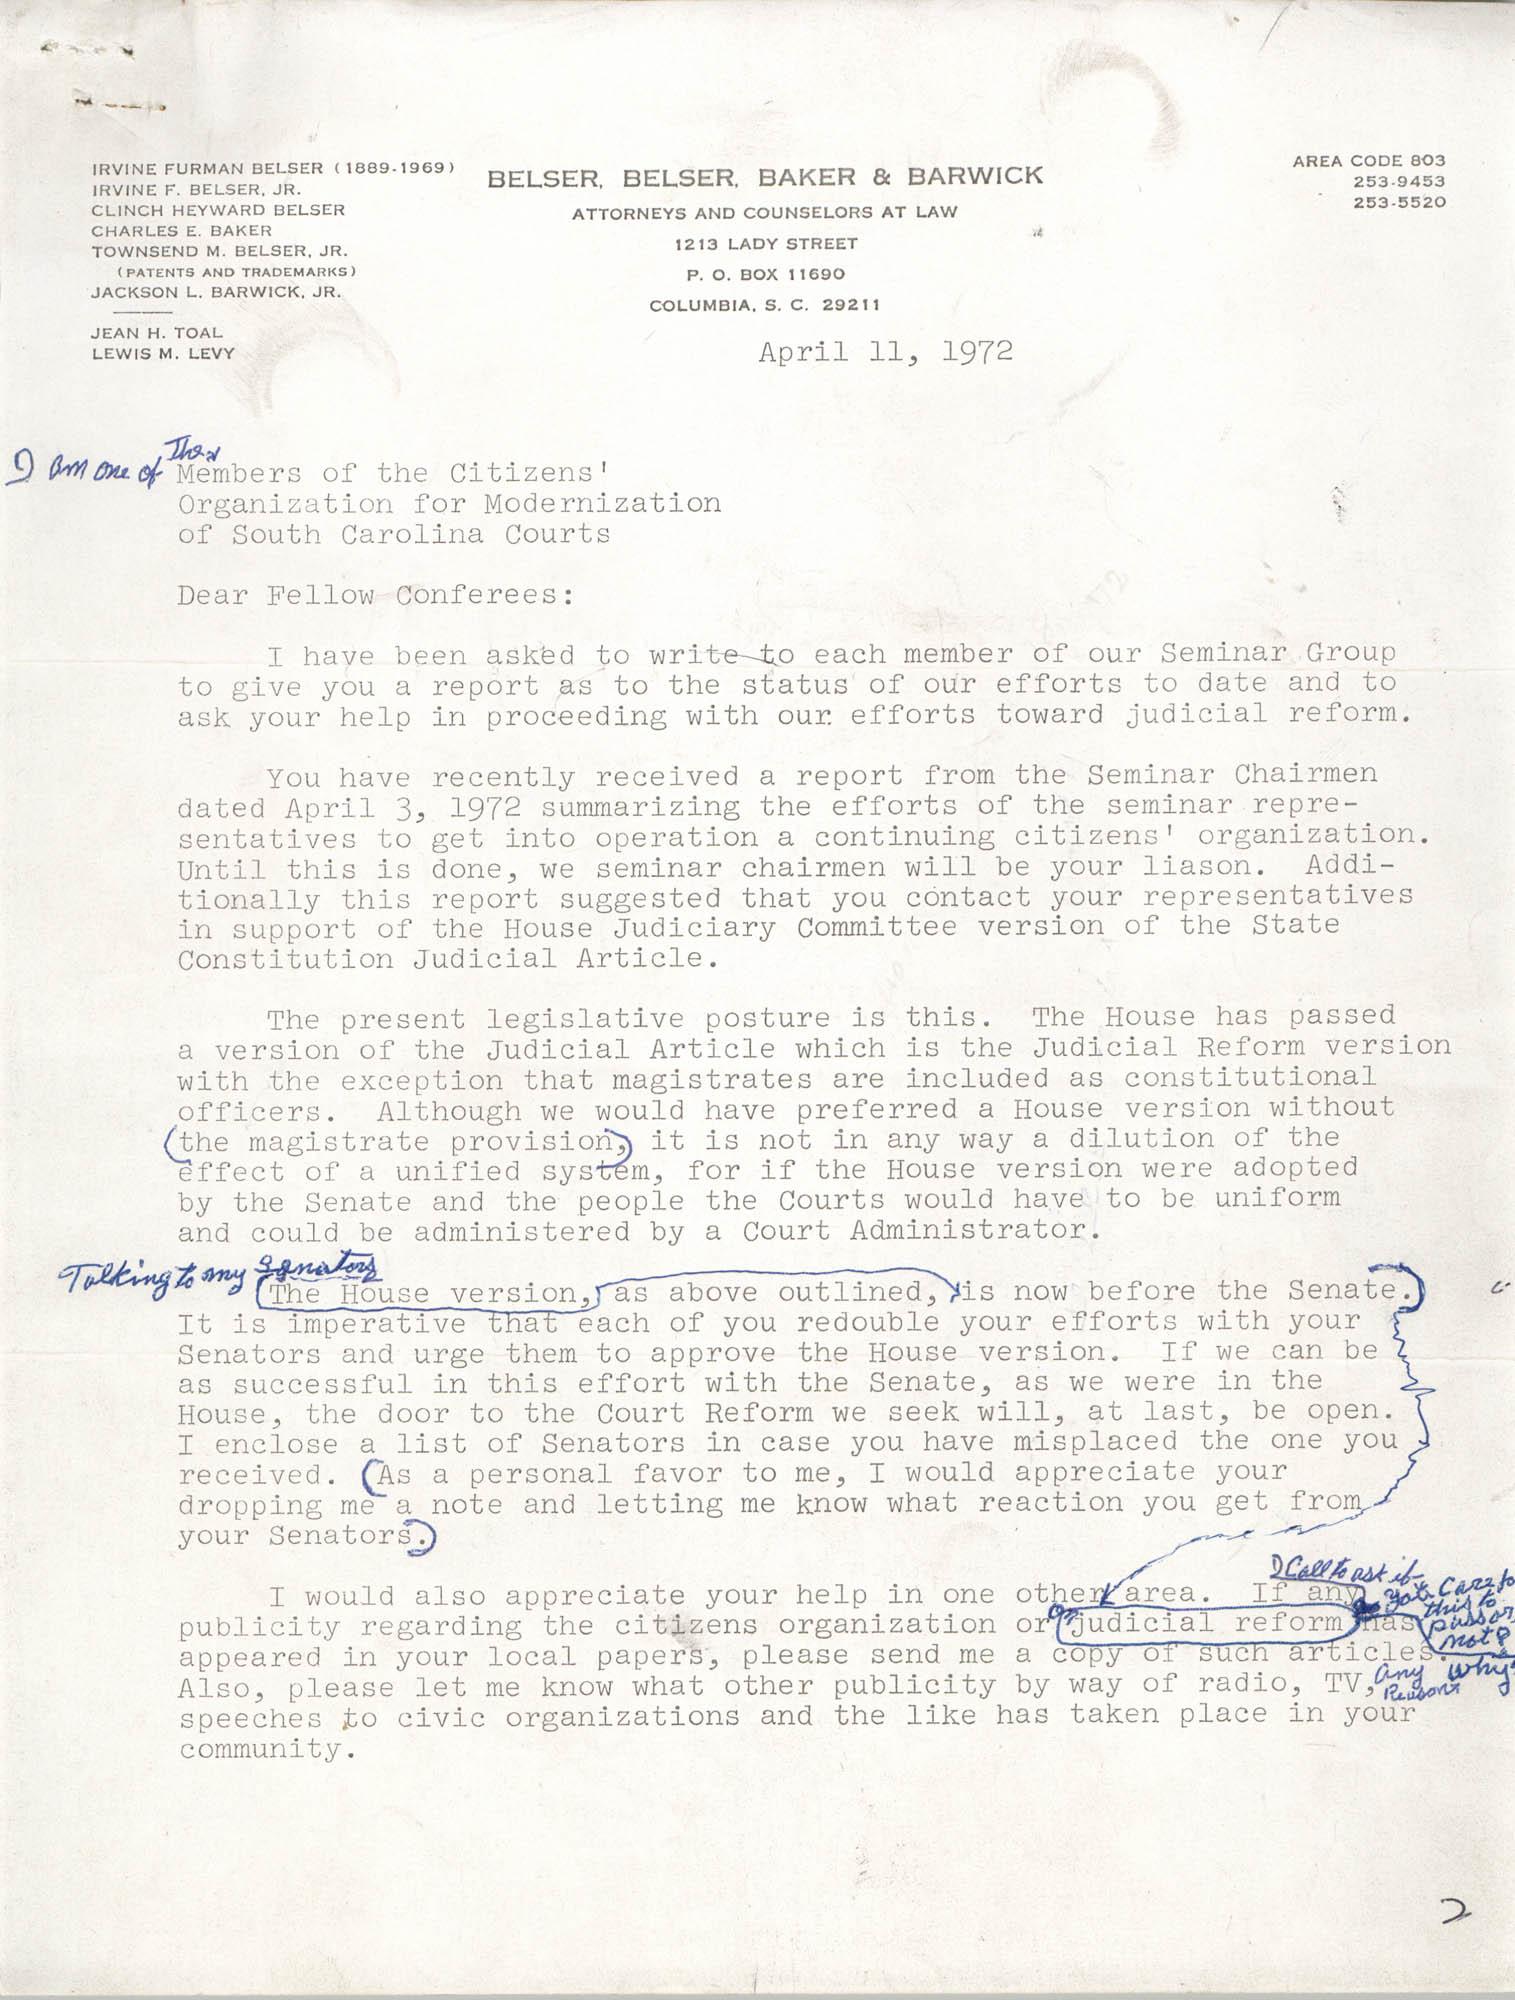 Letter from Jean Hoefer Toal, April 11, 1972